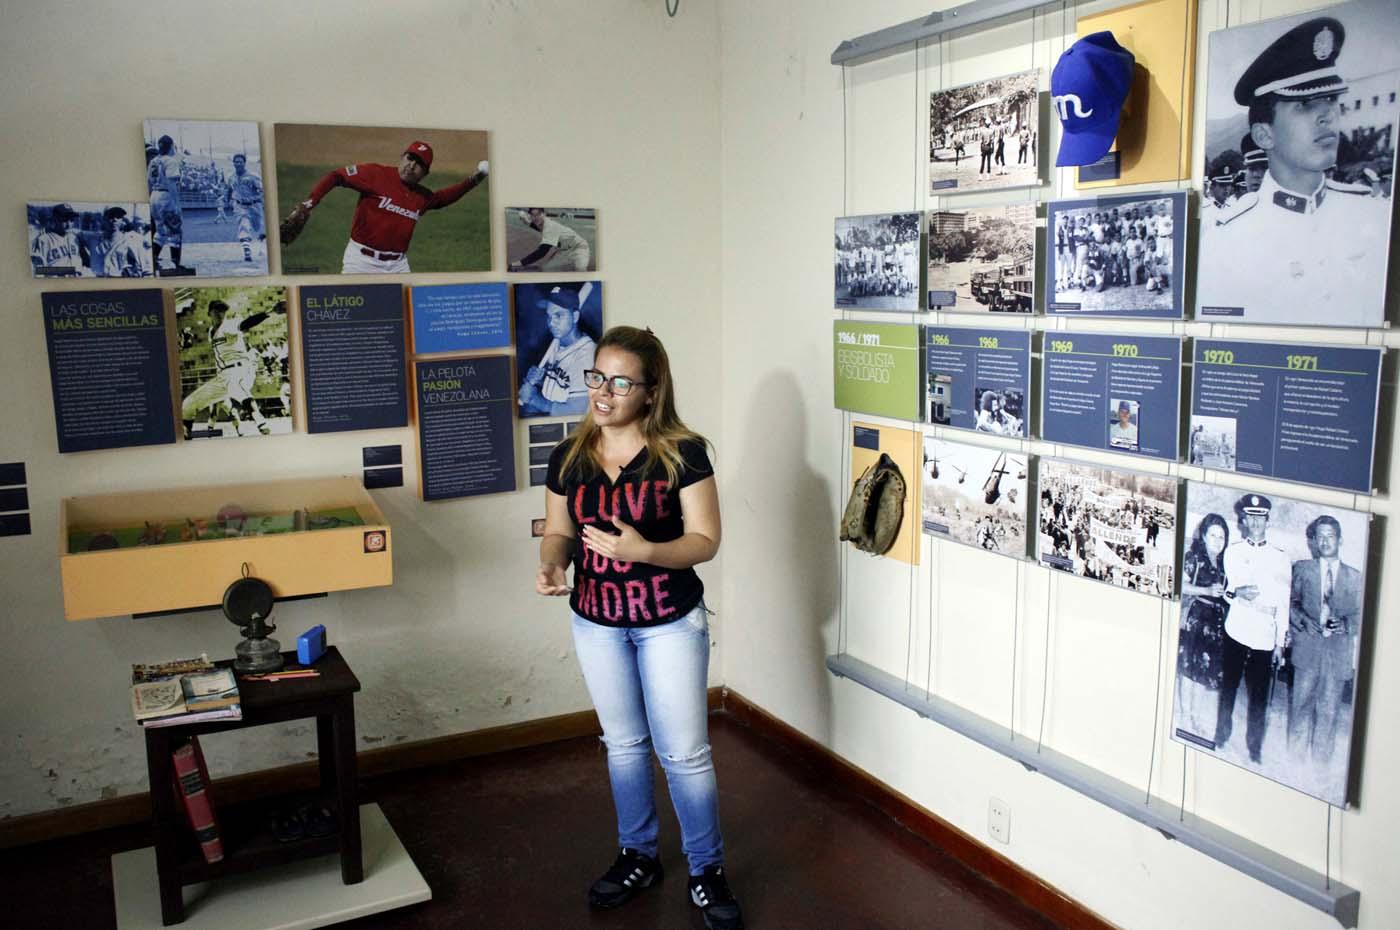 A tour guide talks to people next to pictures of Venezuela's late President Hugo Chavez in his childhood home in Sabaneta, Venezuela June 13, 2017. Picture taken June 13, 2017. REUTERS/Carlos Eduardo Ramirez